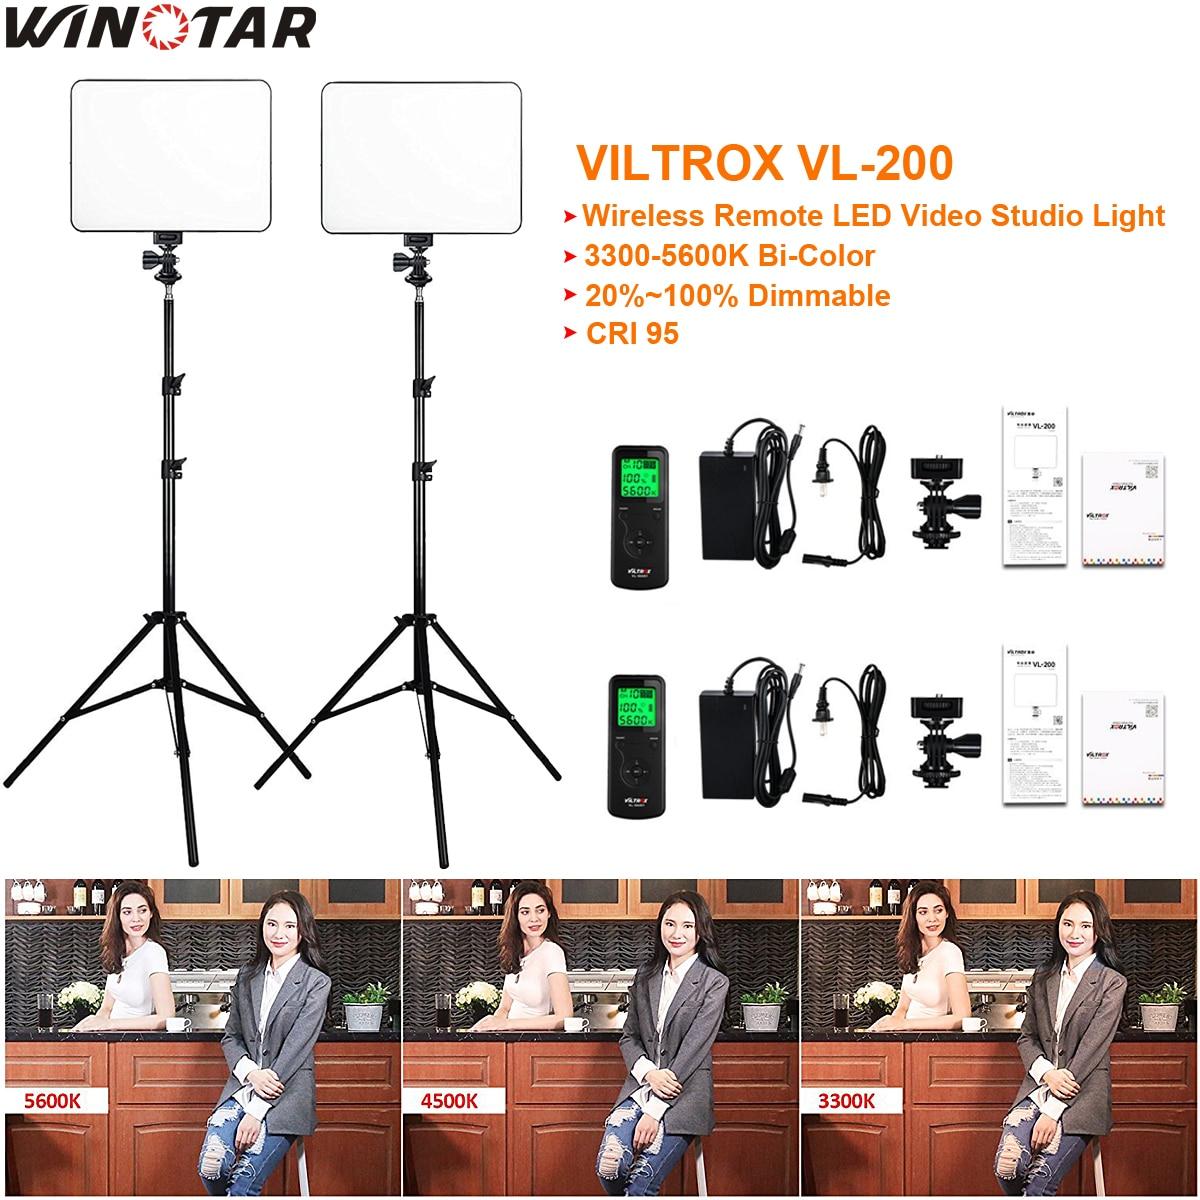 купить 2x VILTROX VL-200 Ultra Thin Dimmable Bi-color LED Video Light Kit / 3300K-5600K CRI 95 + 2x Light Stand + 2x AC adapter онлайн